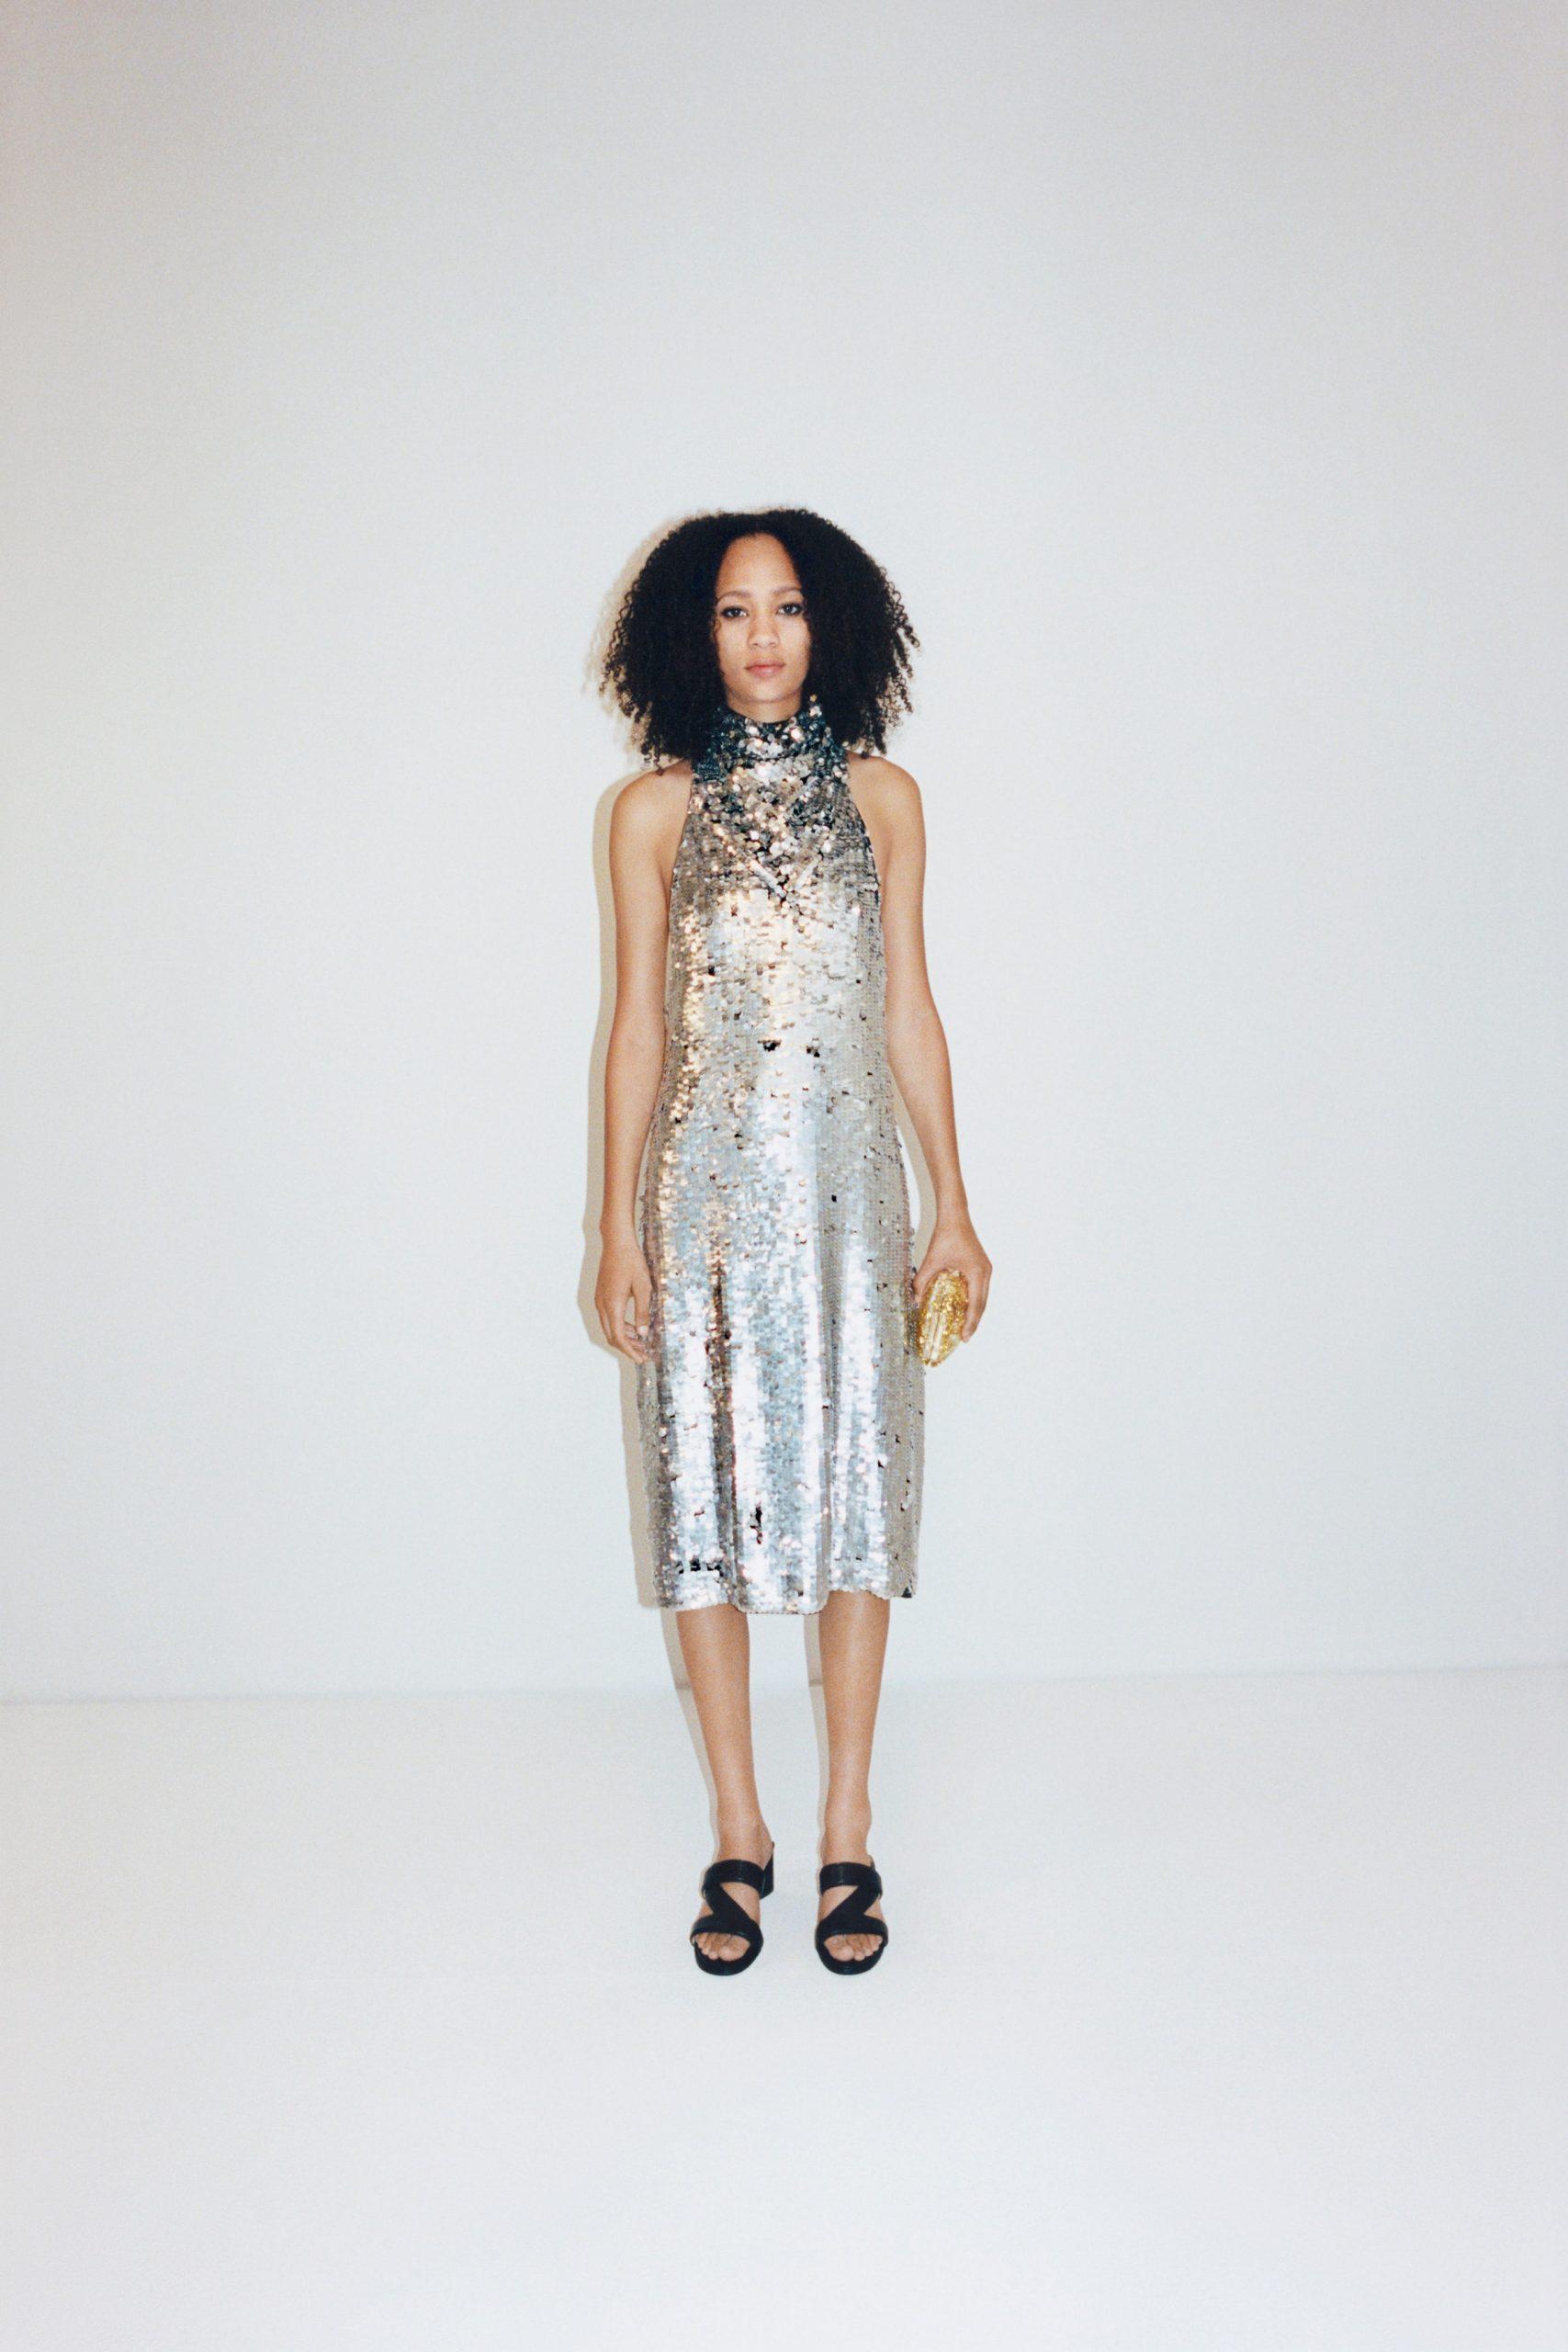 Bottega Veneta Resort 2021 Fashion Collection Photos